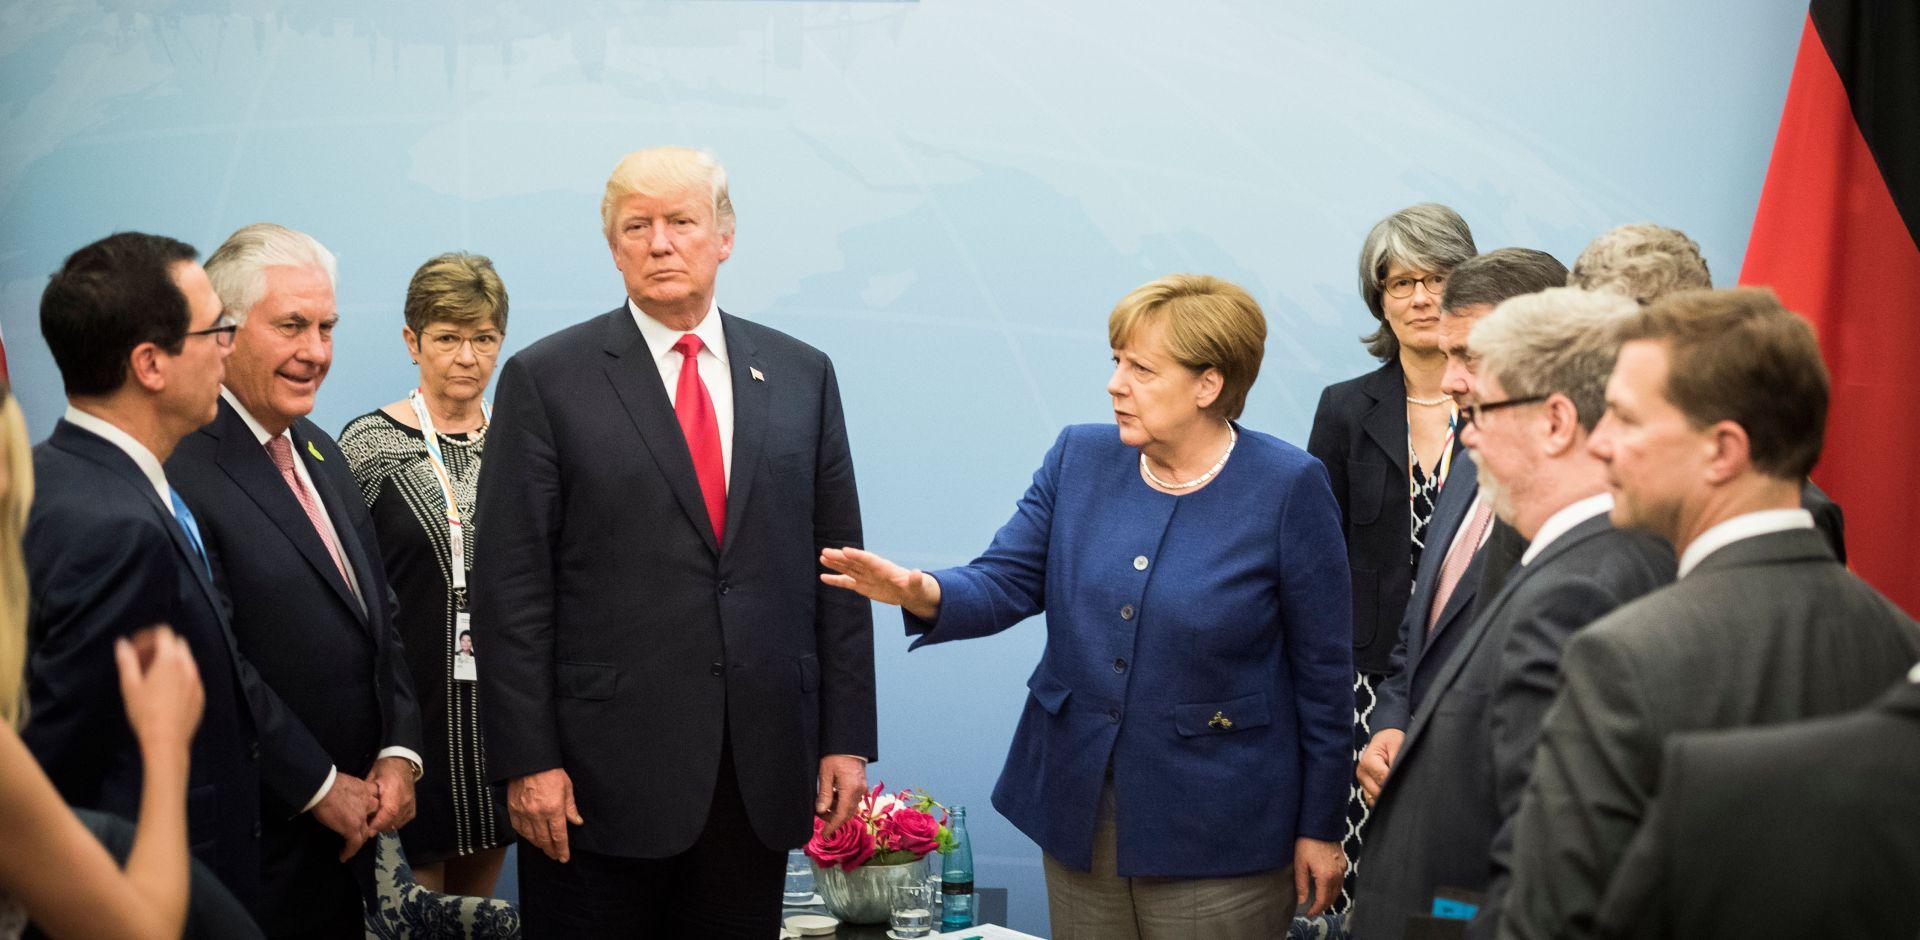 HAMBURG Otvoren summit, Merkel pozdravlja čelnike G20